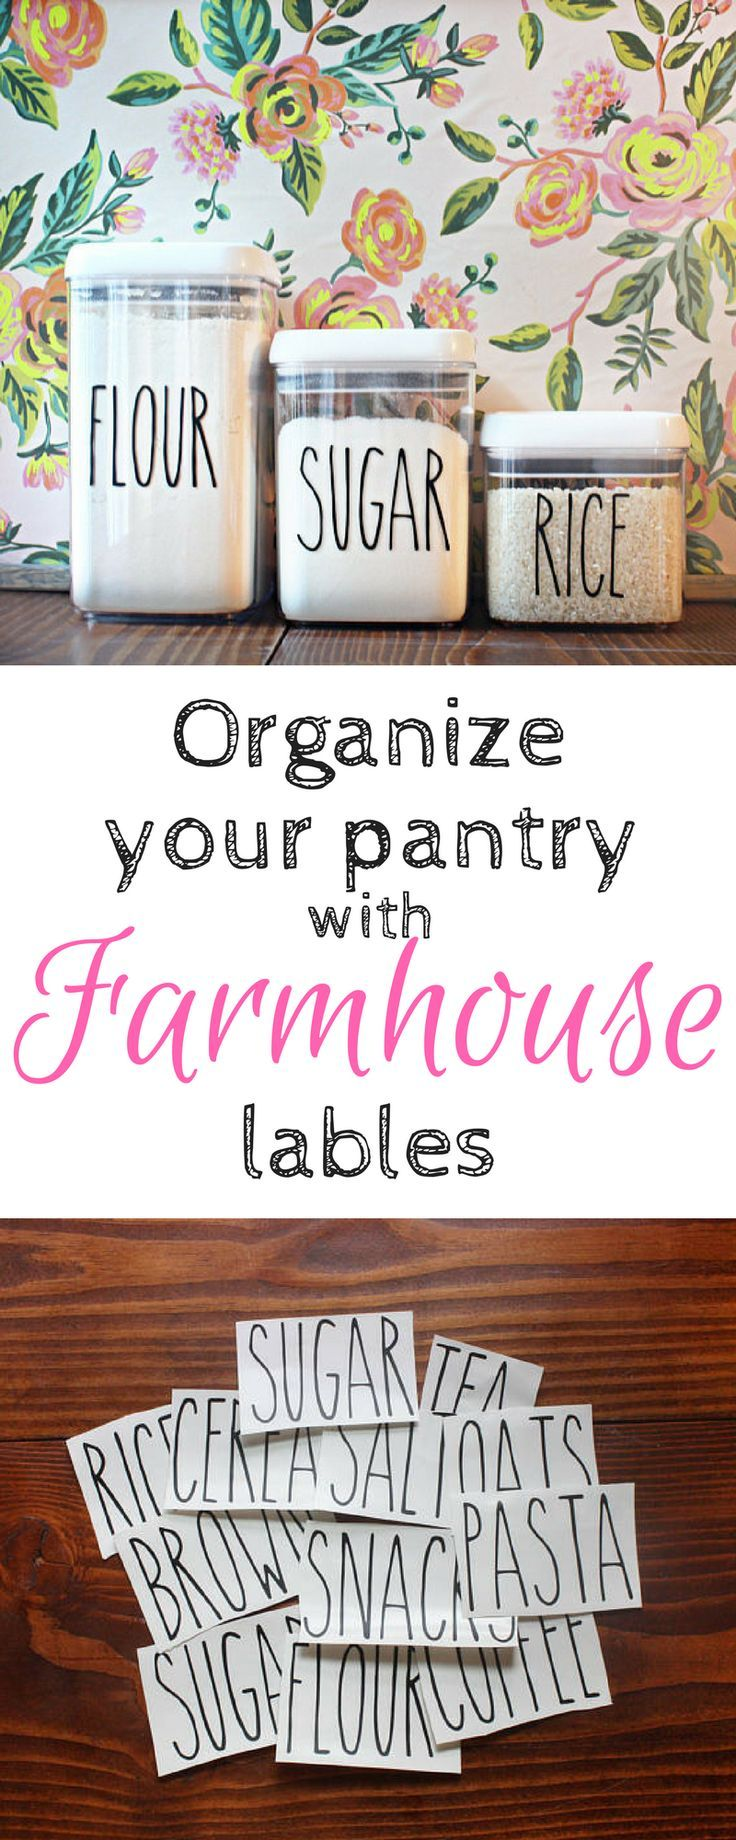 Best 25 Pantry labels ideas on Pinterest  Organized pantry Pantry storage and Mason jar storage